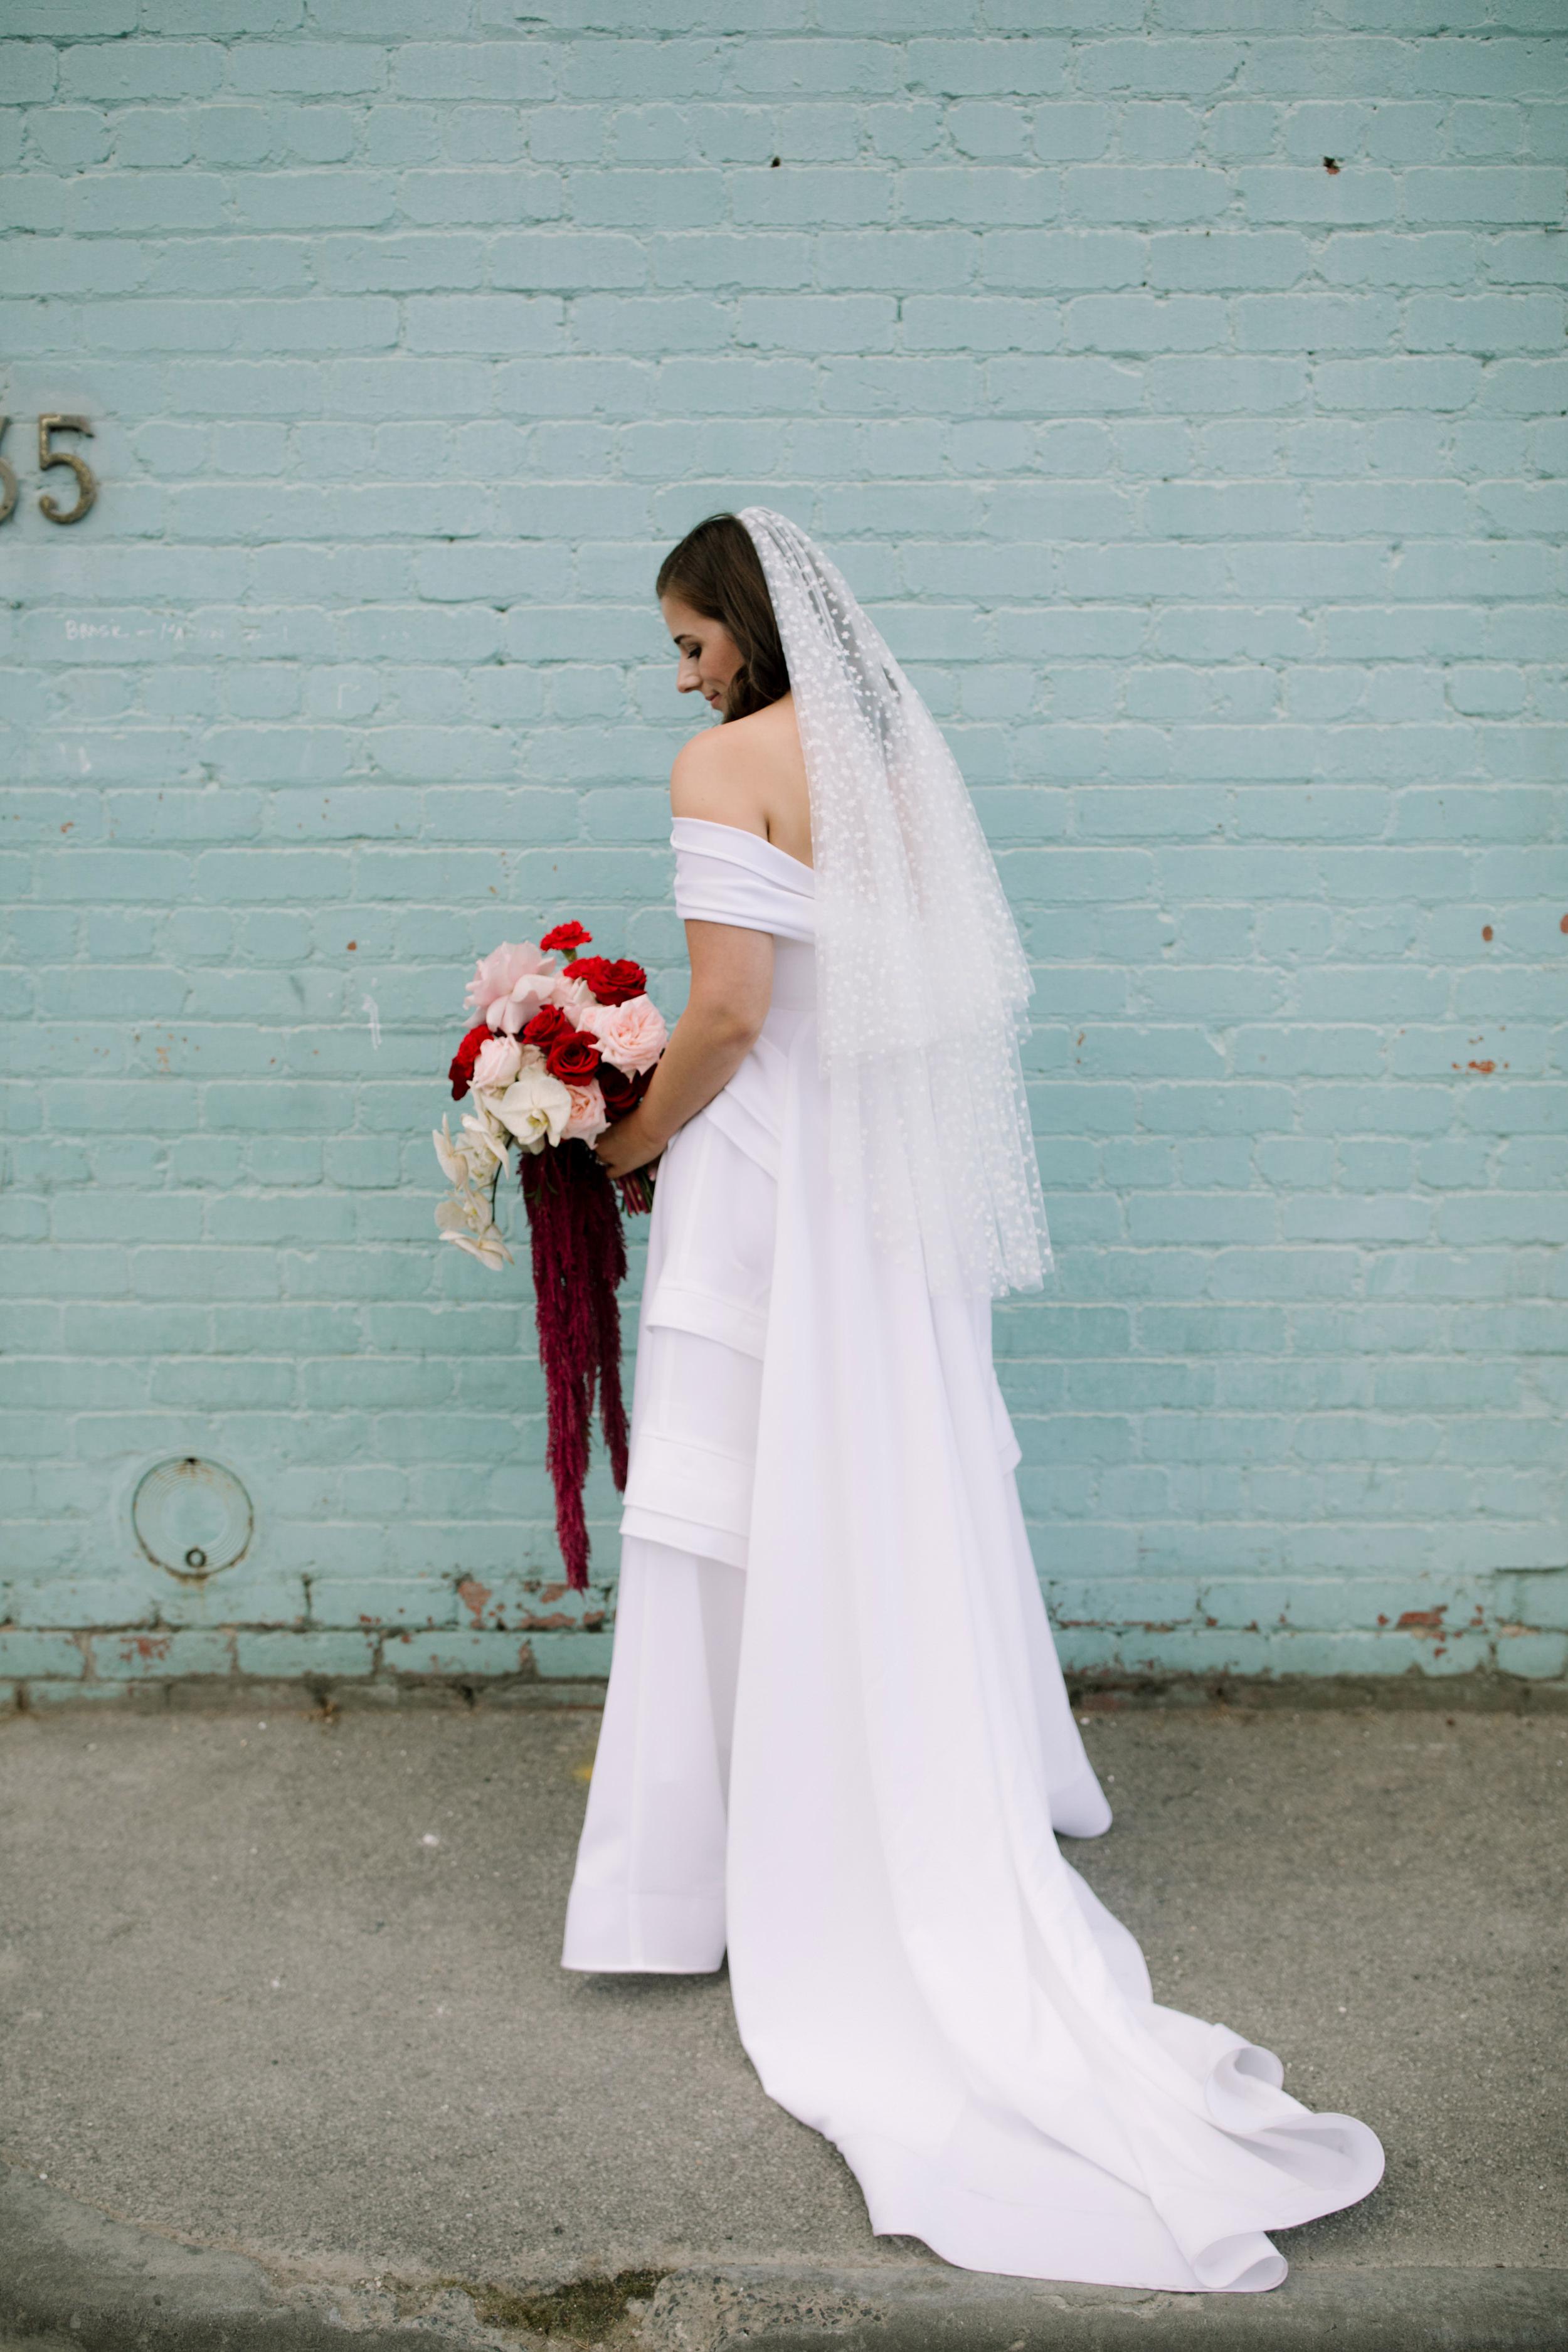 I-Got-You-Babe-Weddings-Tahlia&Mitch-Butler-Lane-Wedding0225.JPG